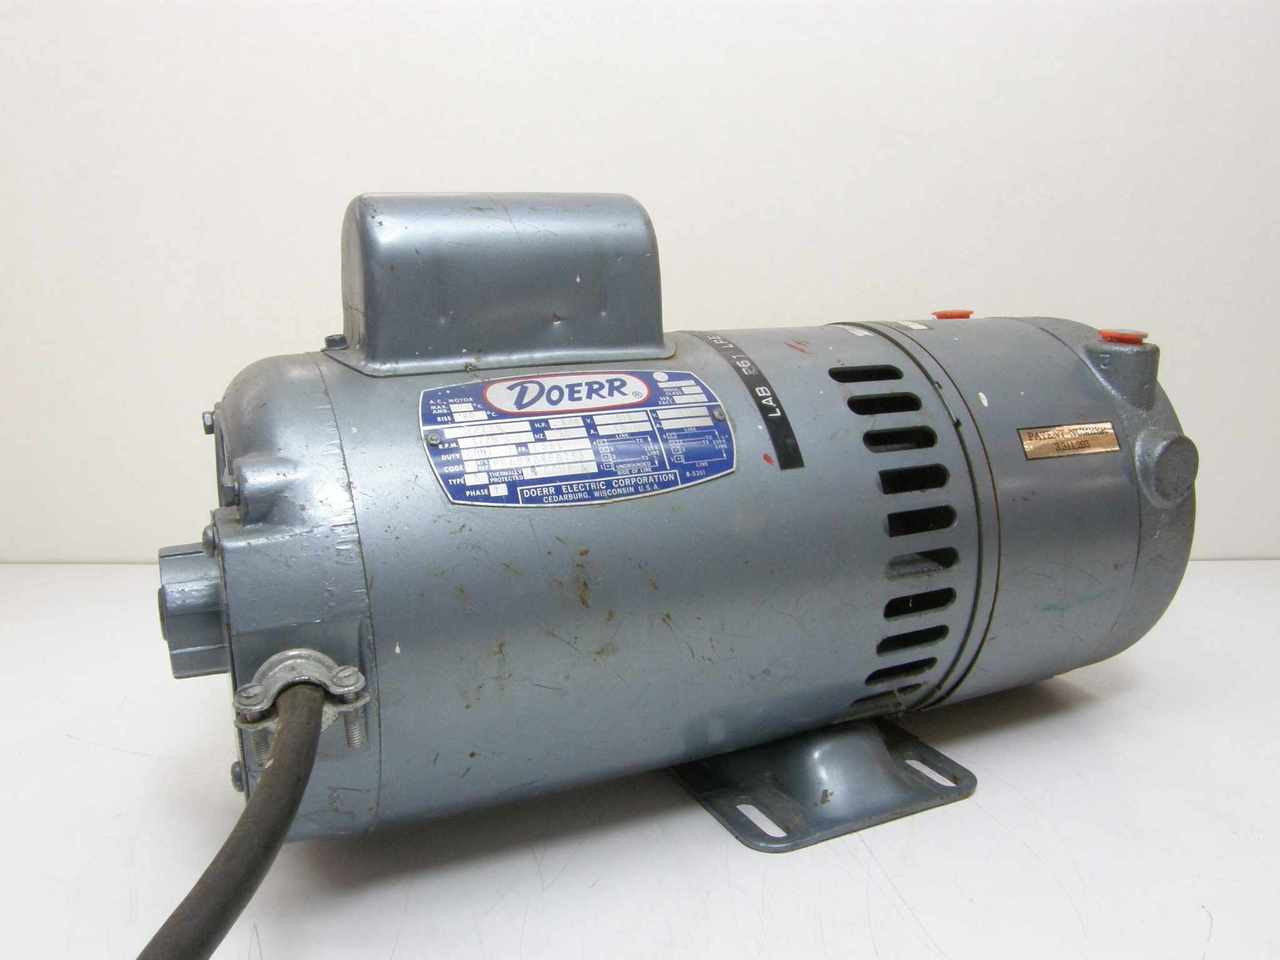 gast 1022 v103 0272x oil less vacuum pumpdoerr motor d272x 1.35__98502.1490177222?c=2 gast 1022 v103 0272x oil less vacuum pump~doerr motor d272x gast vacuum pump wiring diagrams at soozxer.org